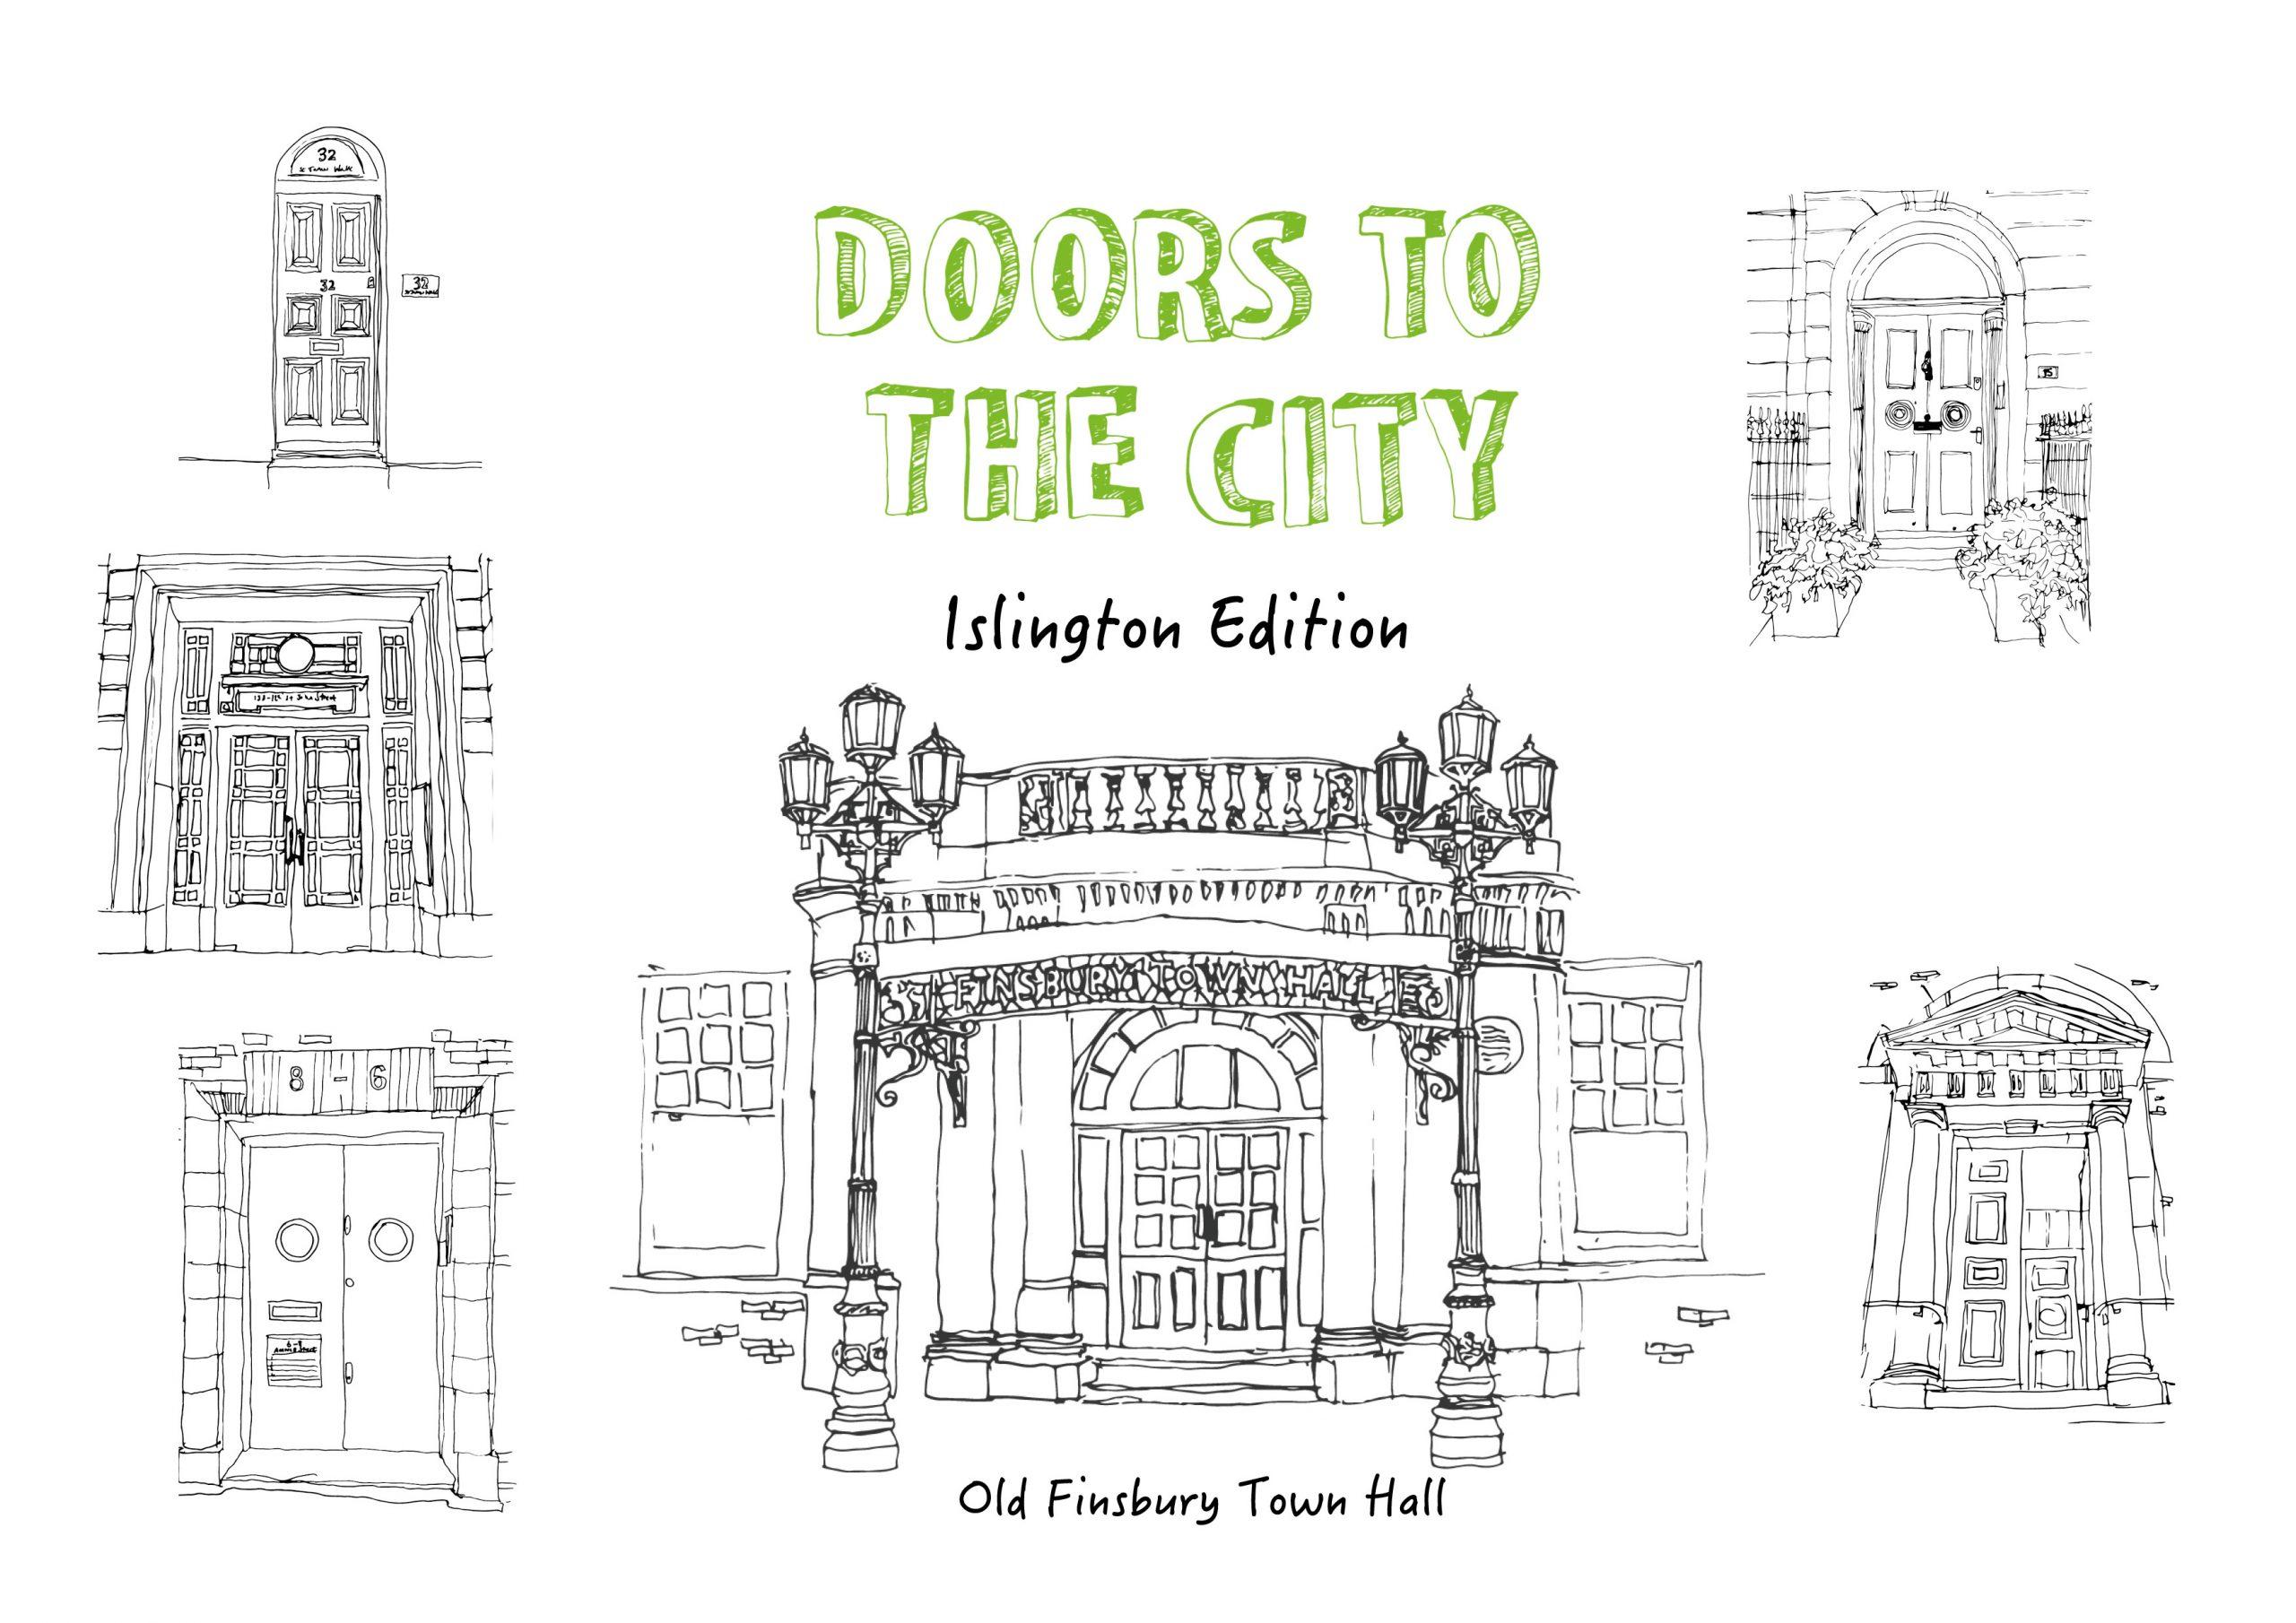 Doors to the City